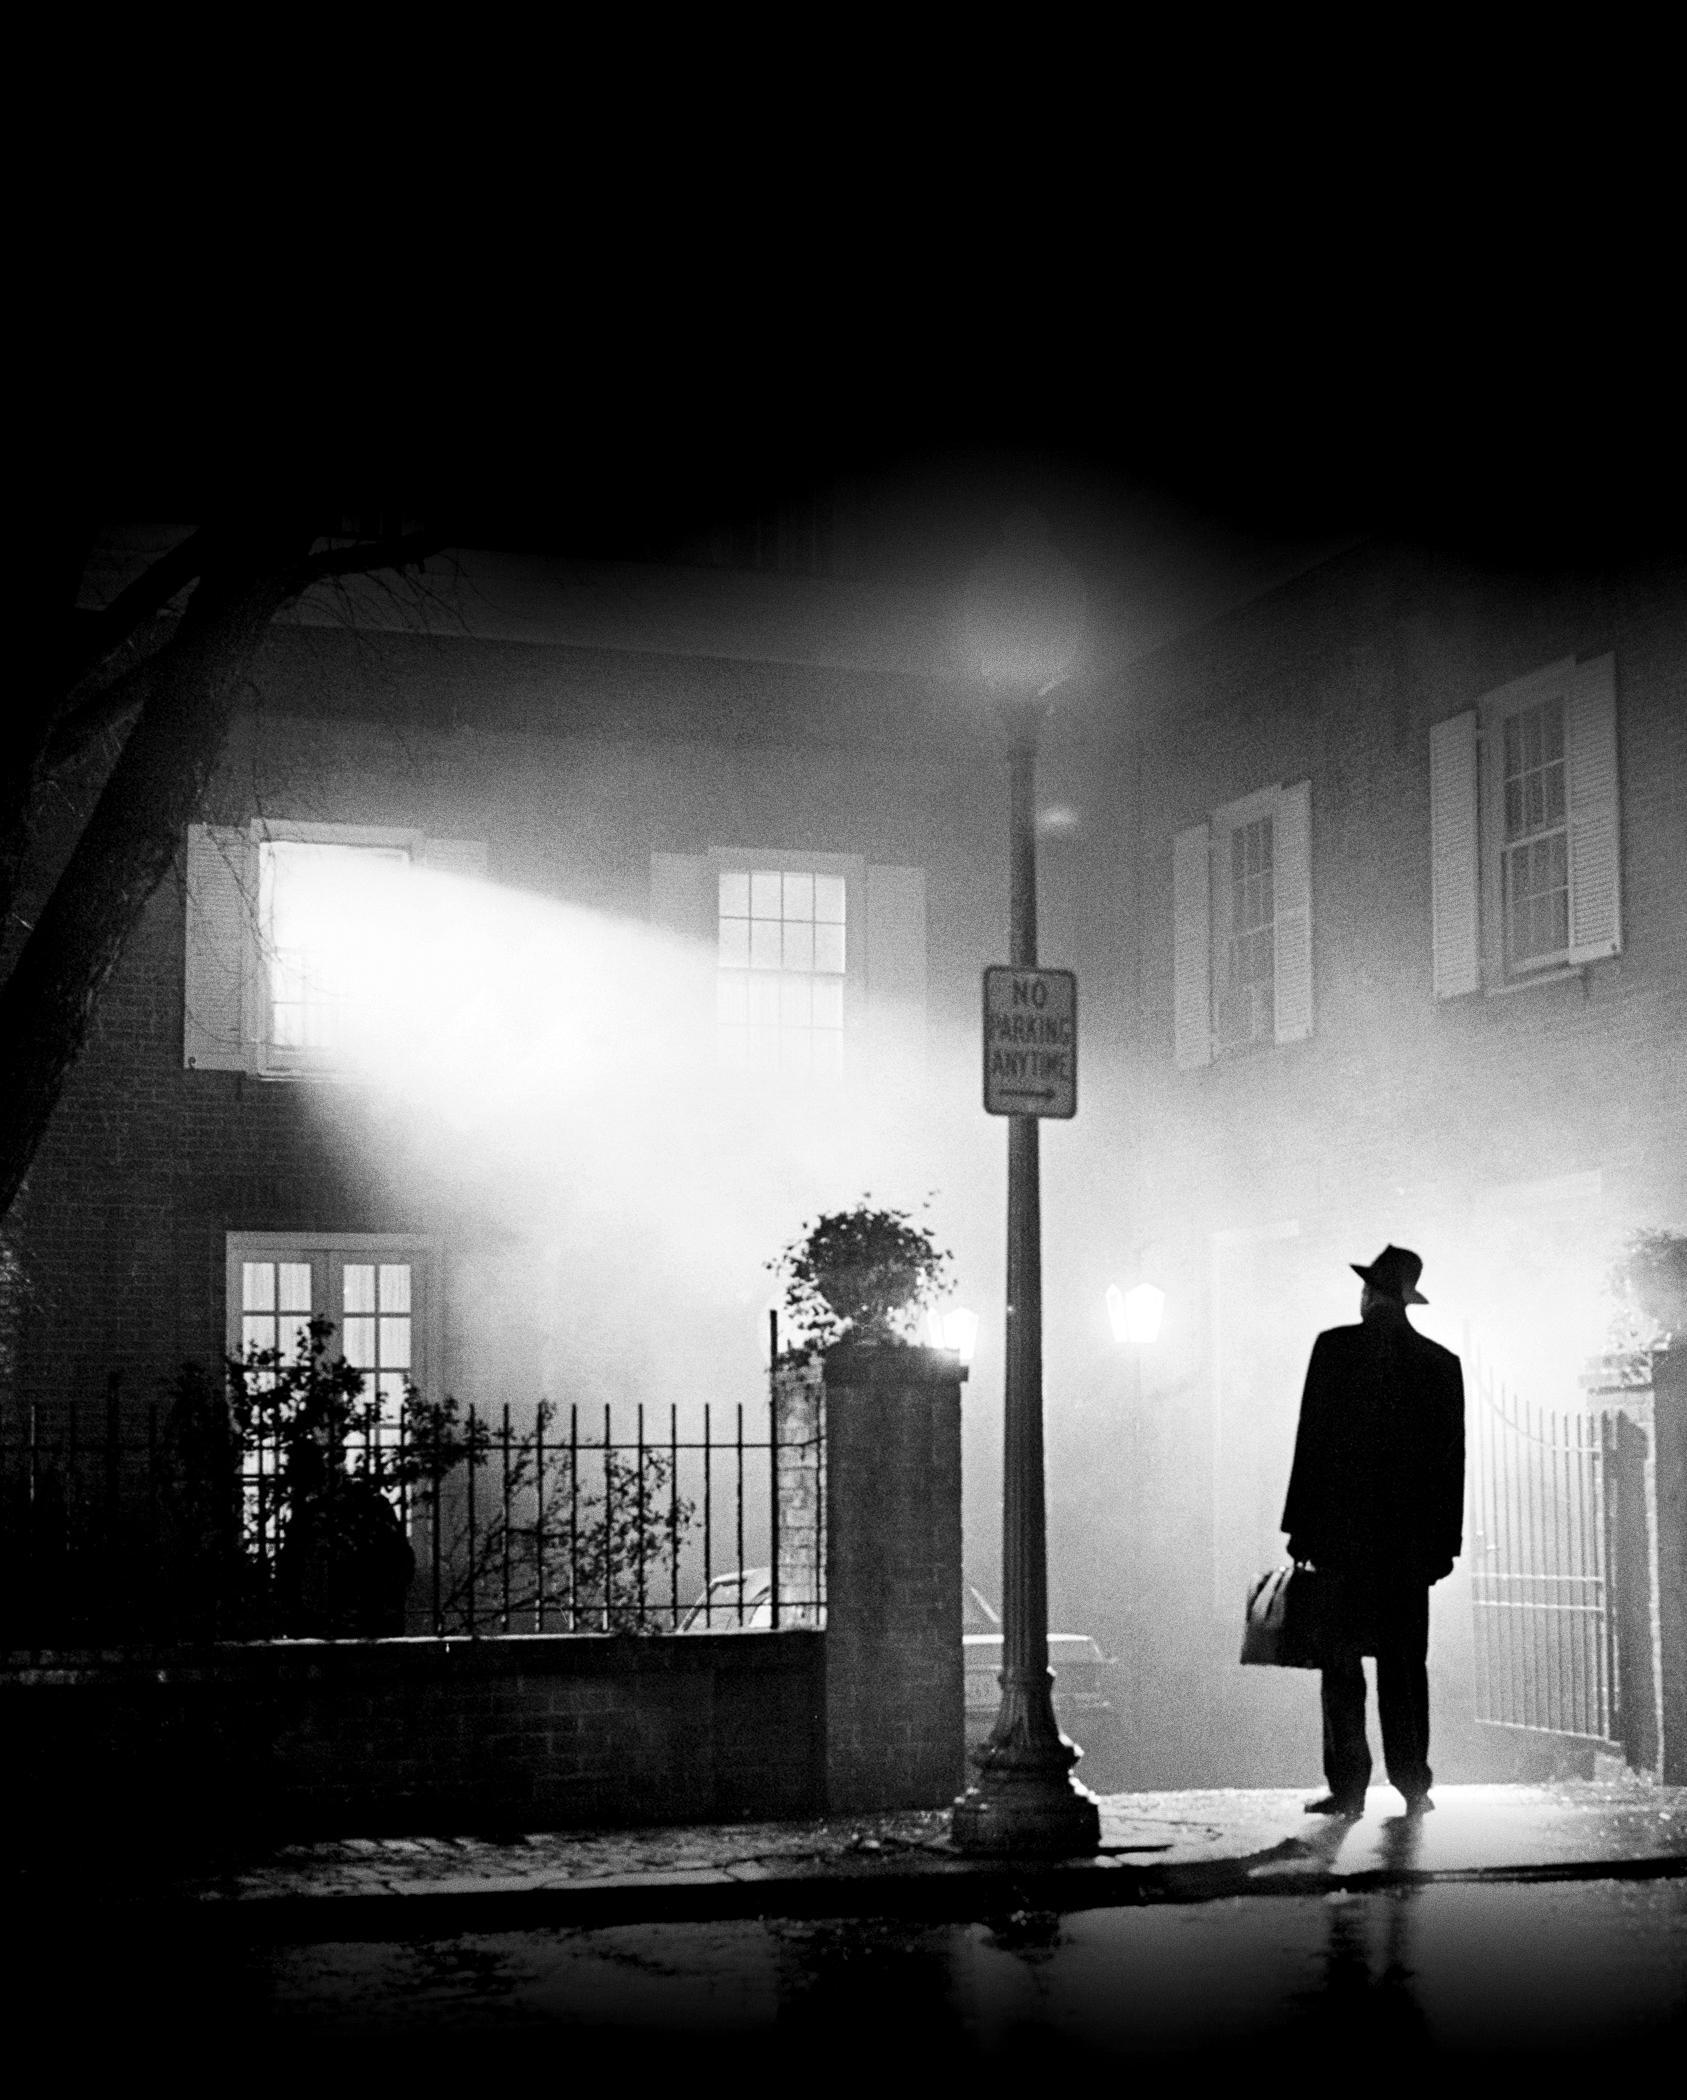 El Exorcista (1973) - William Friedkin